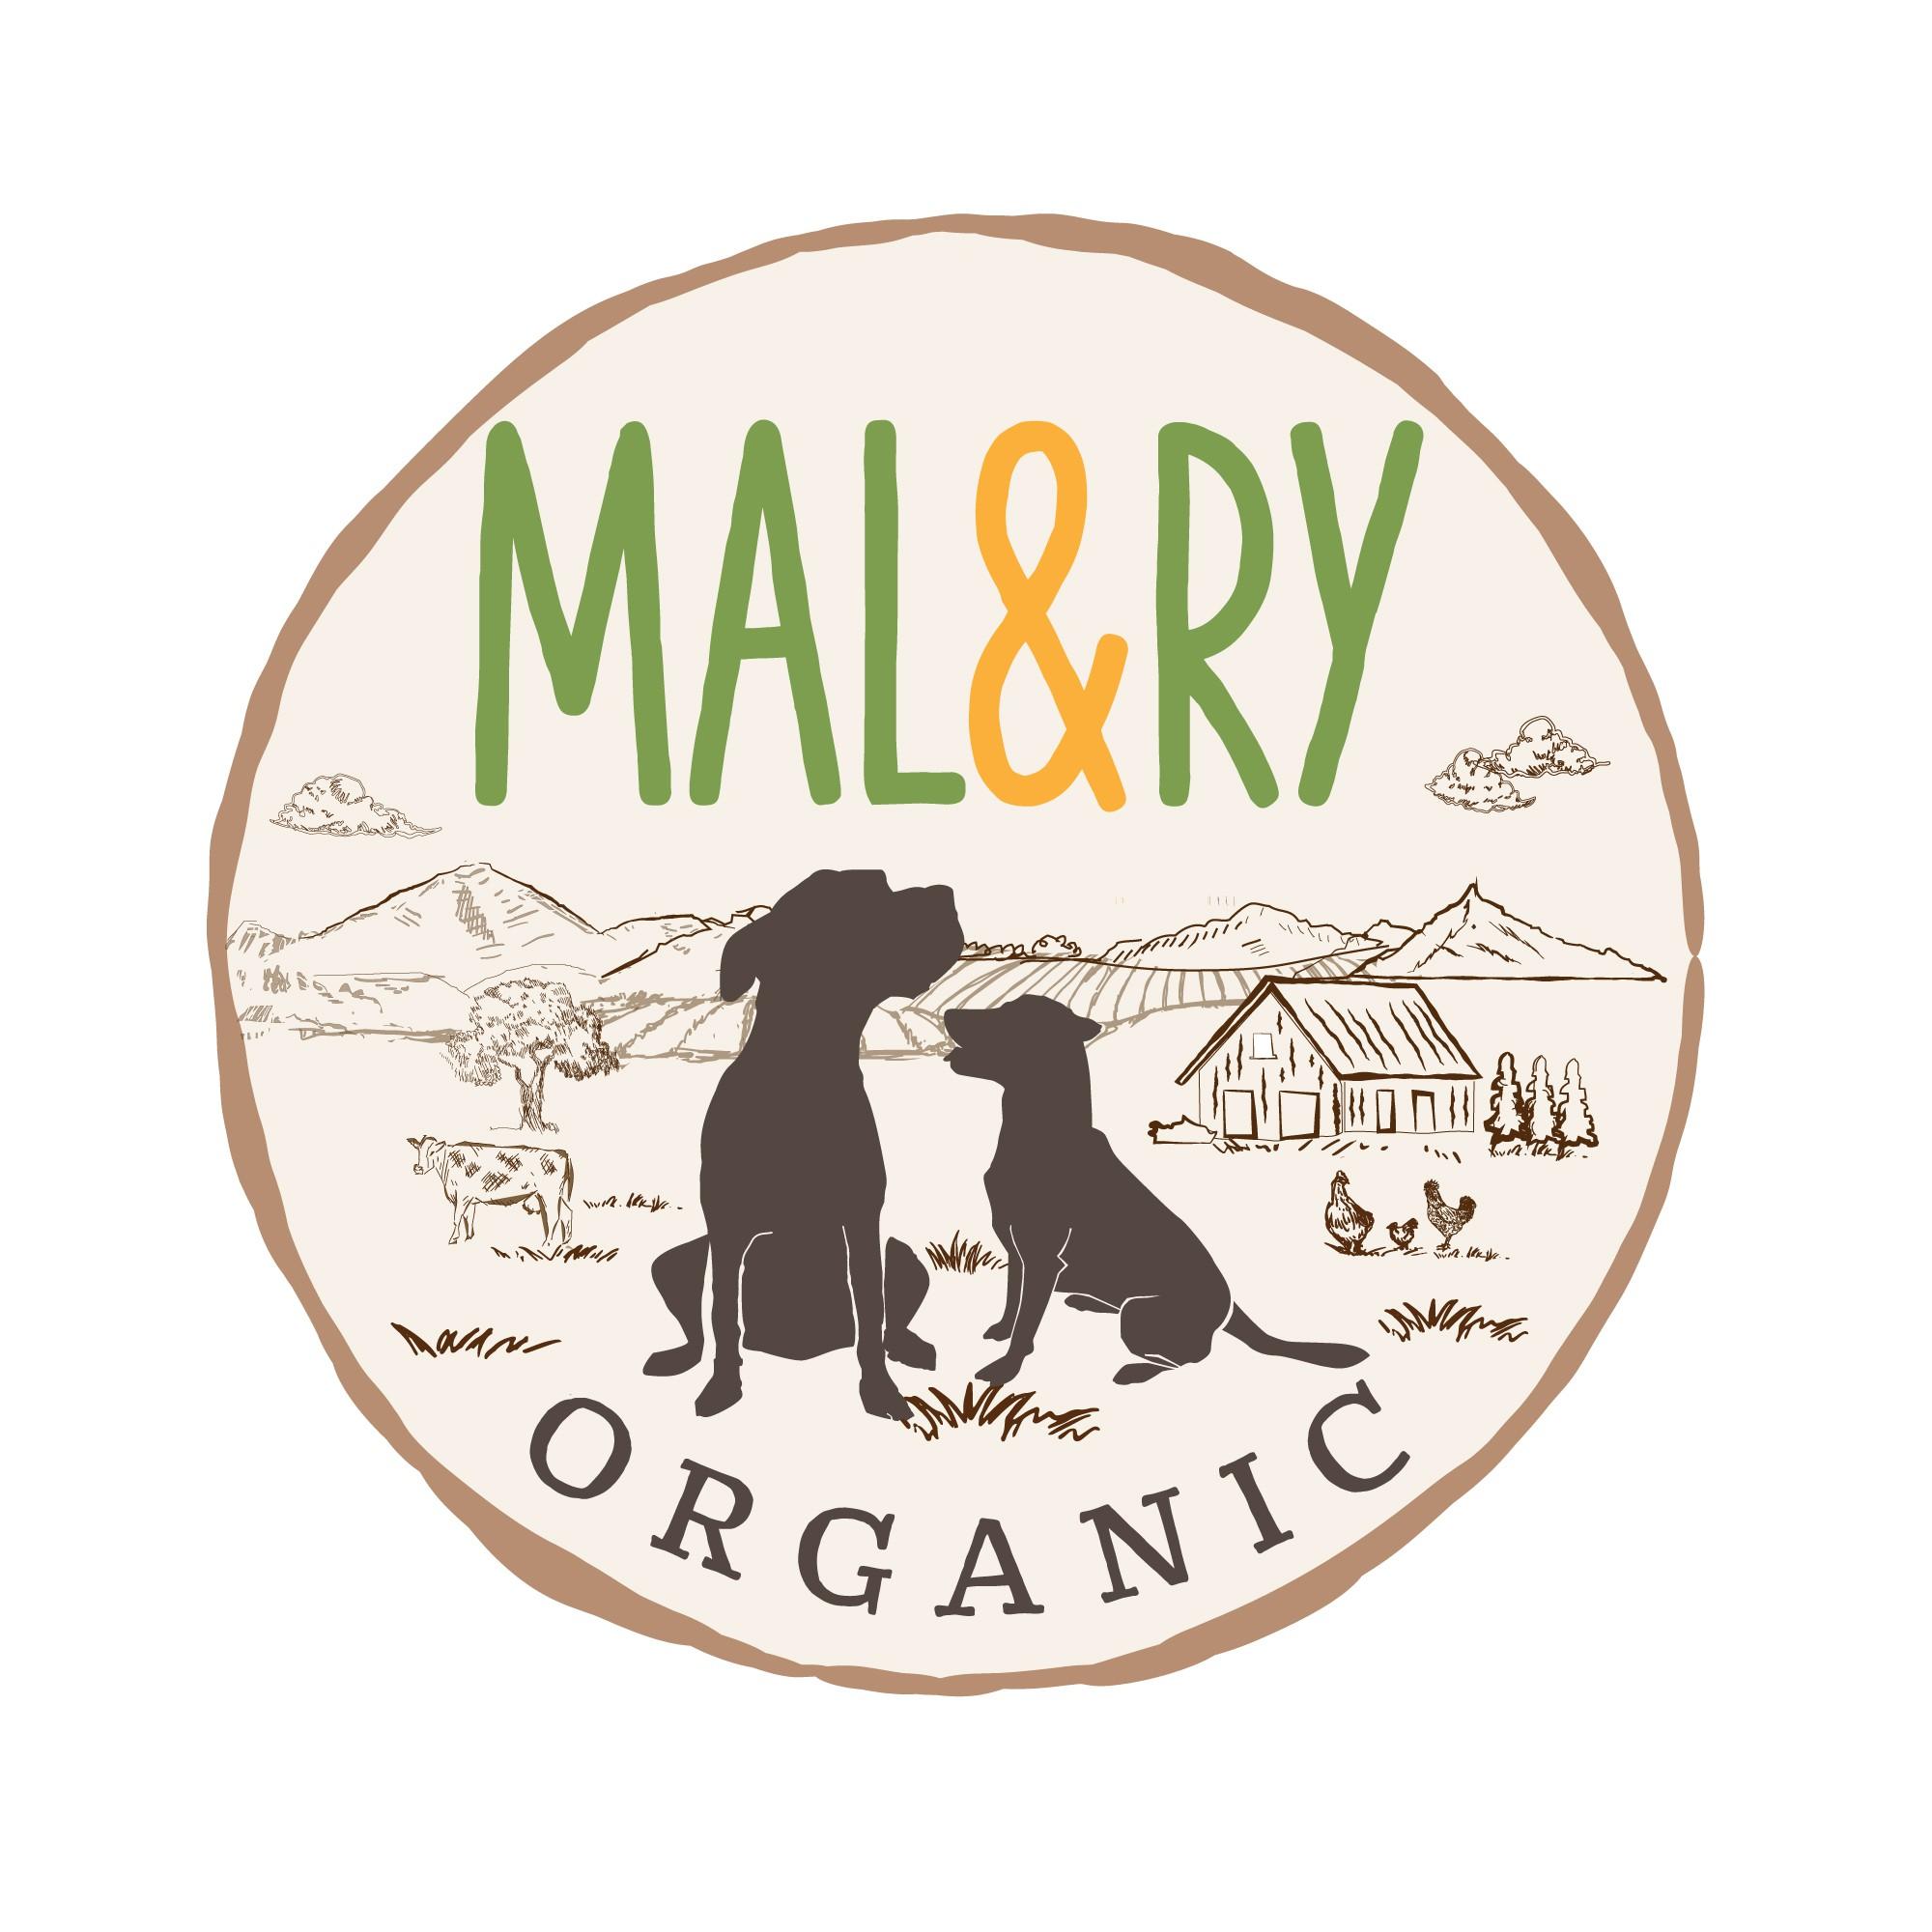 We need an organic fell sending a message of health